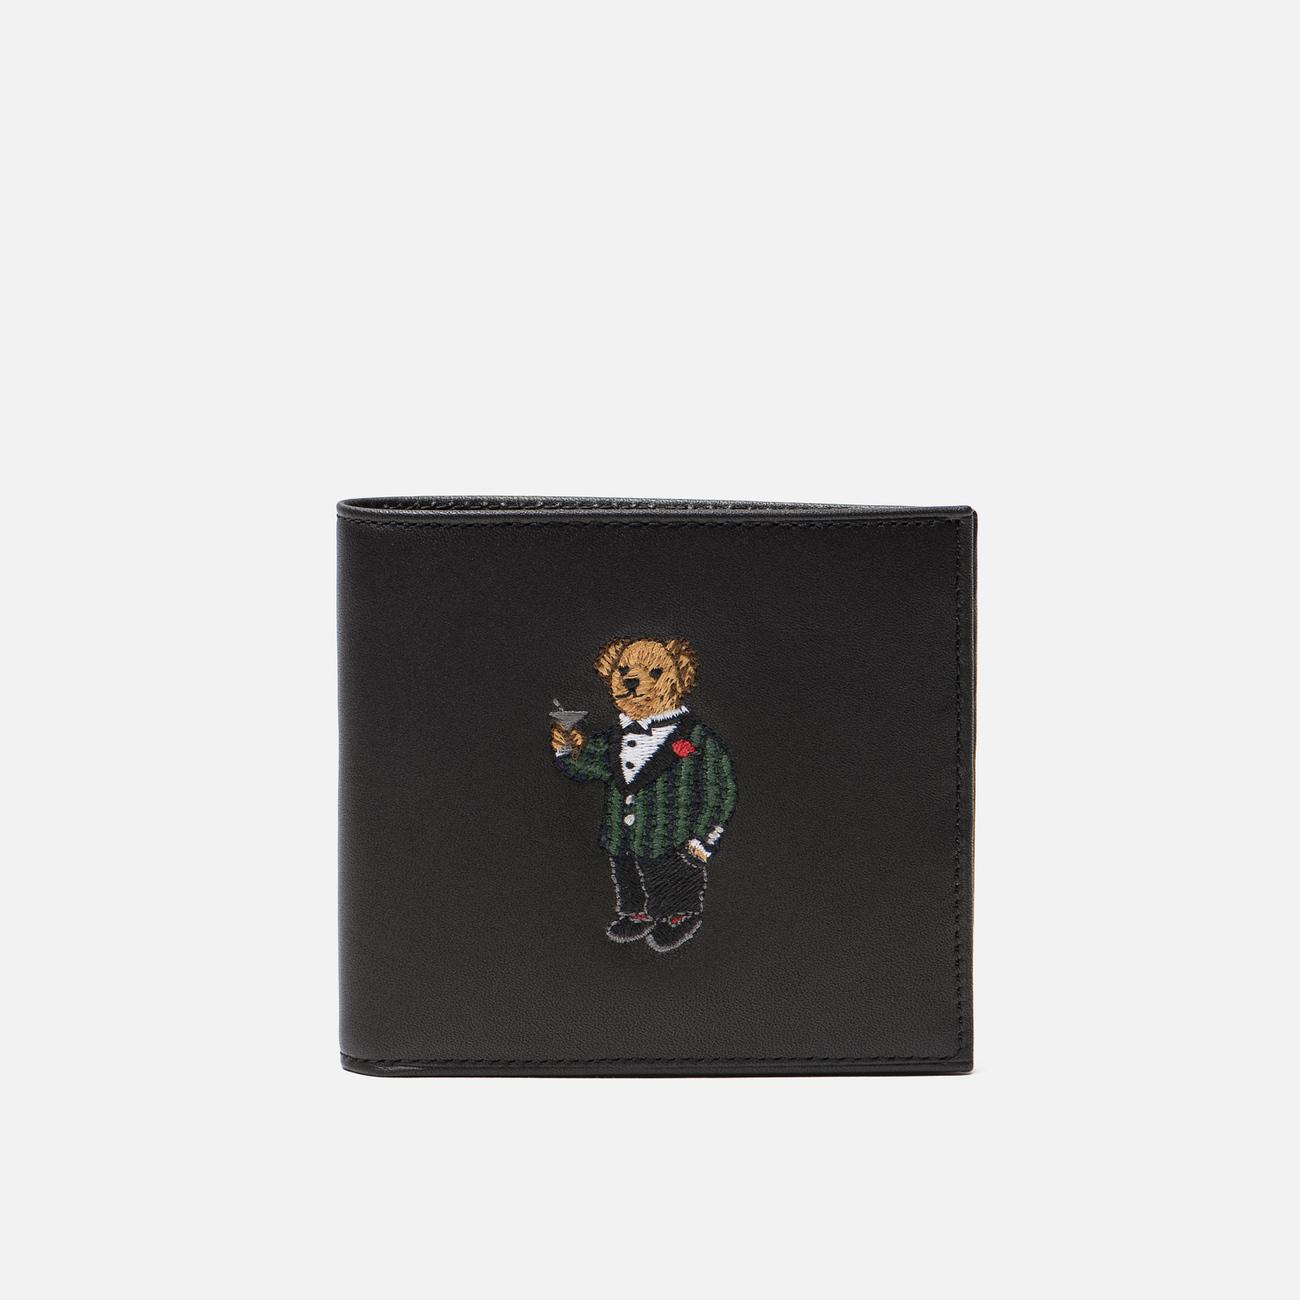 Кошелек Polo Ralph Lauren Tartan Bear Billfold Small Smooth Leather Black